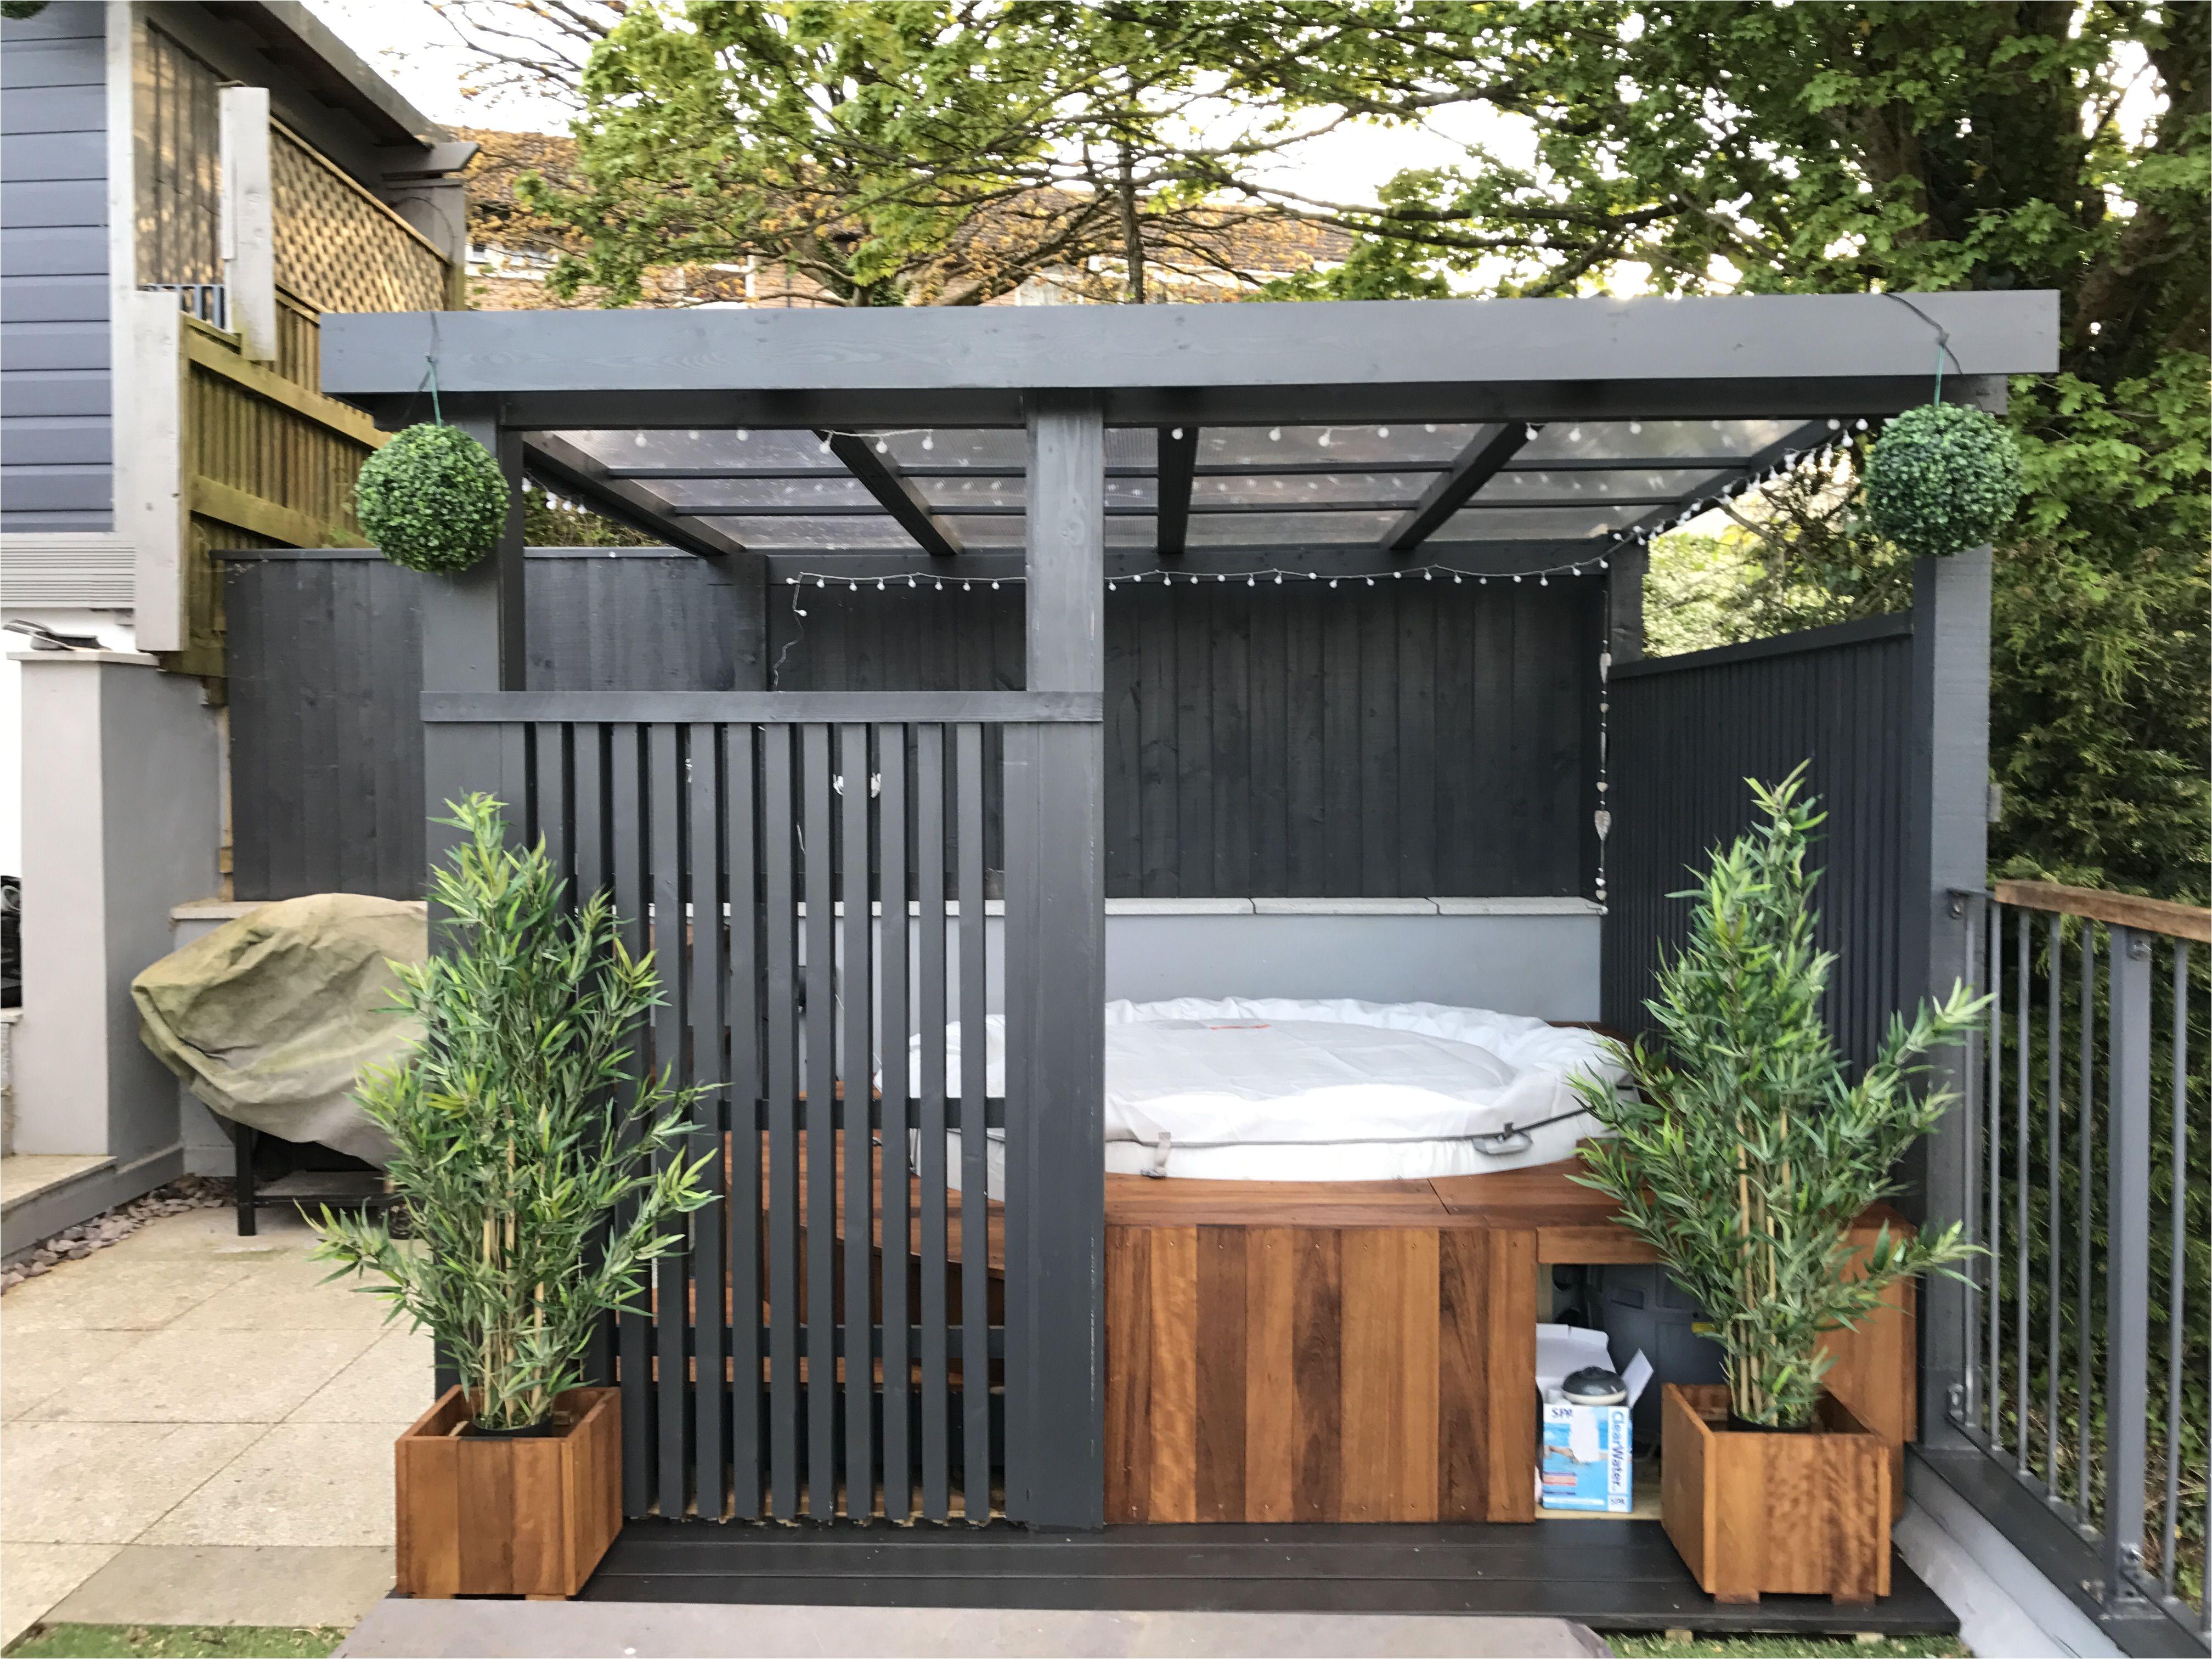 Hot Tub Designs and Layouts Modern Grey Pergola Lazy Spa Hot Tub Iroko Surround House Hot